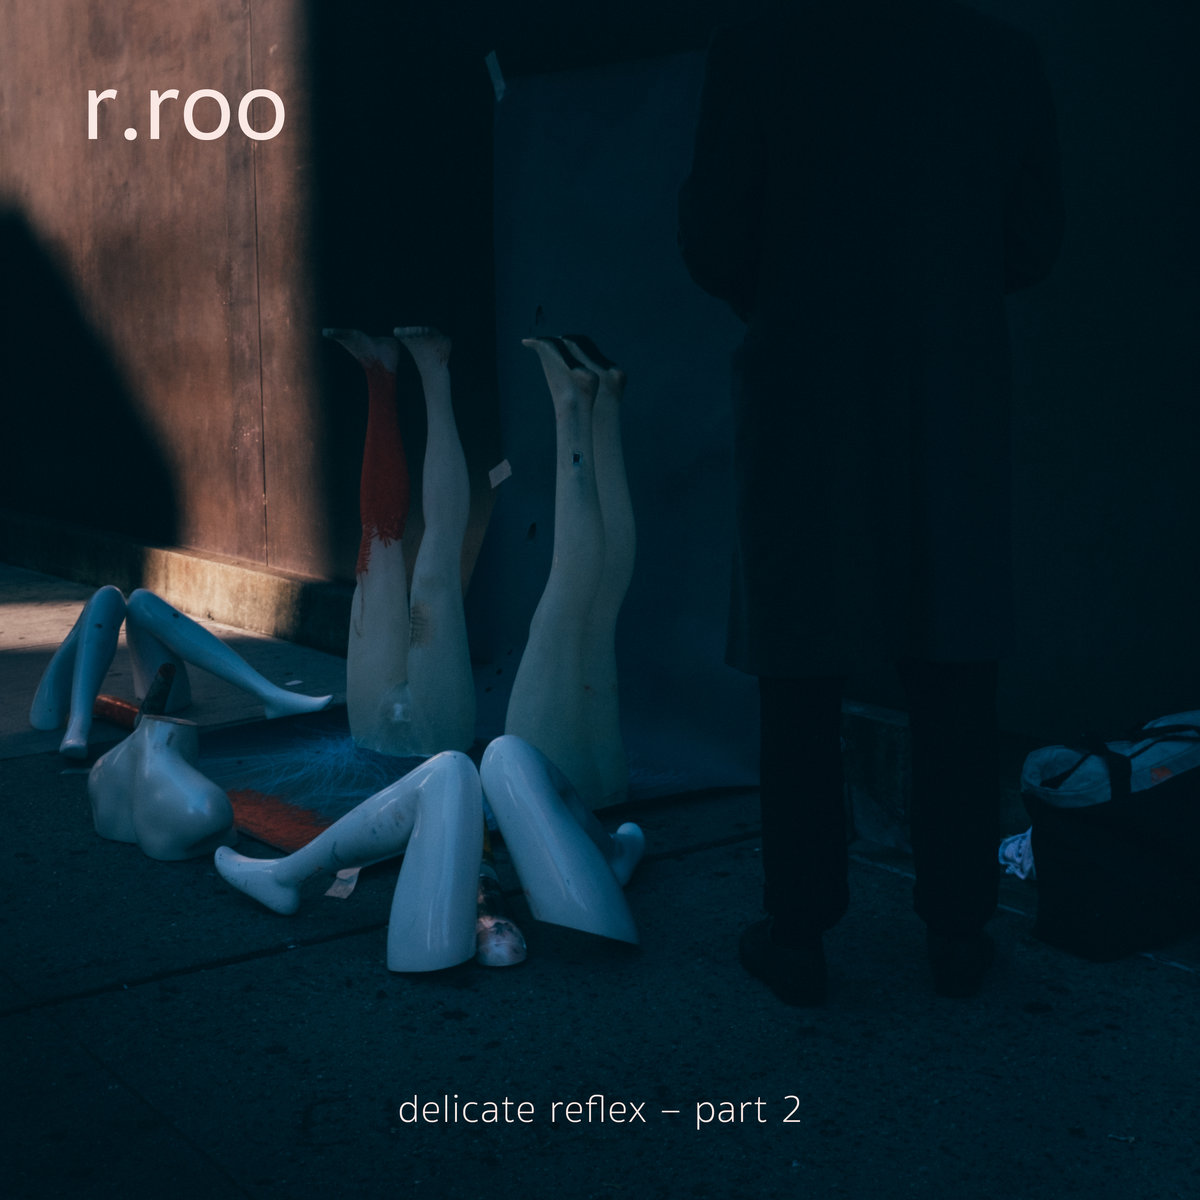 r.roo — delicate reflex — part 2